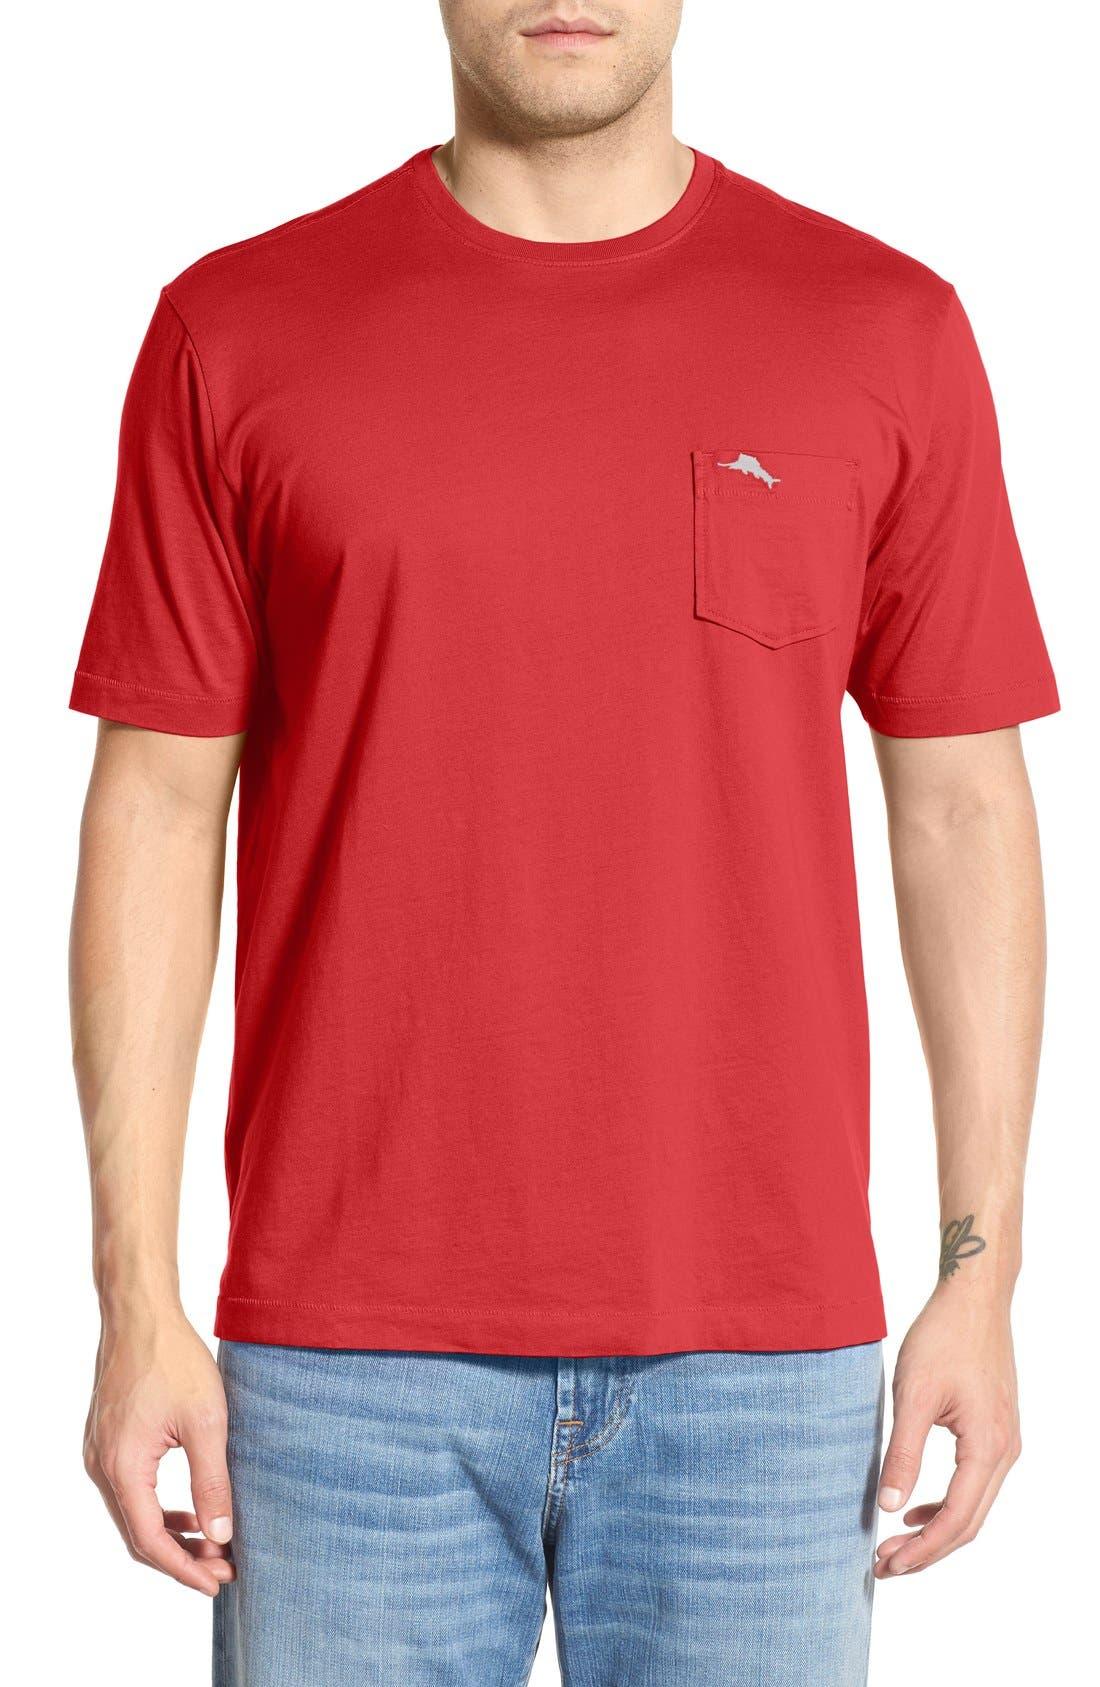 Main Image - Tommy Bahama 'New Bali Sky' Original Fit Crewneck Pocket T-Shirt